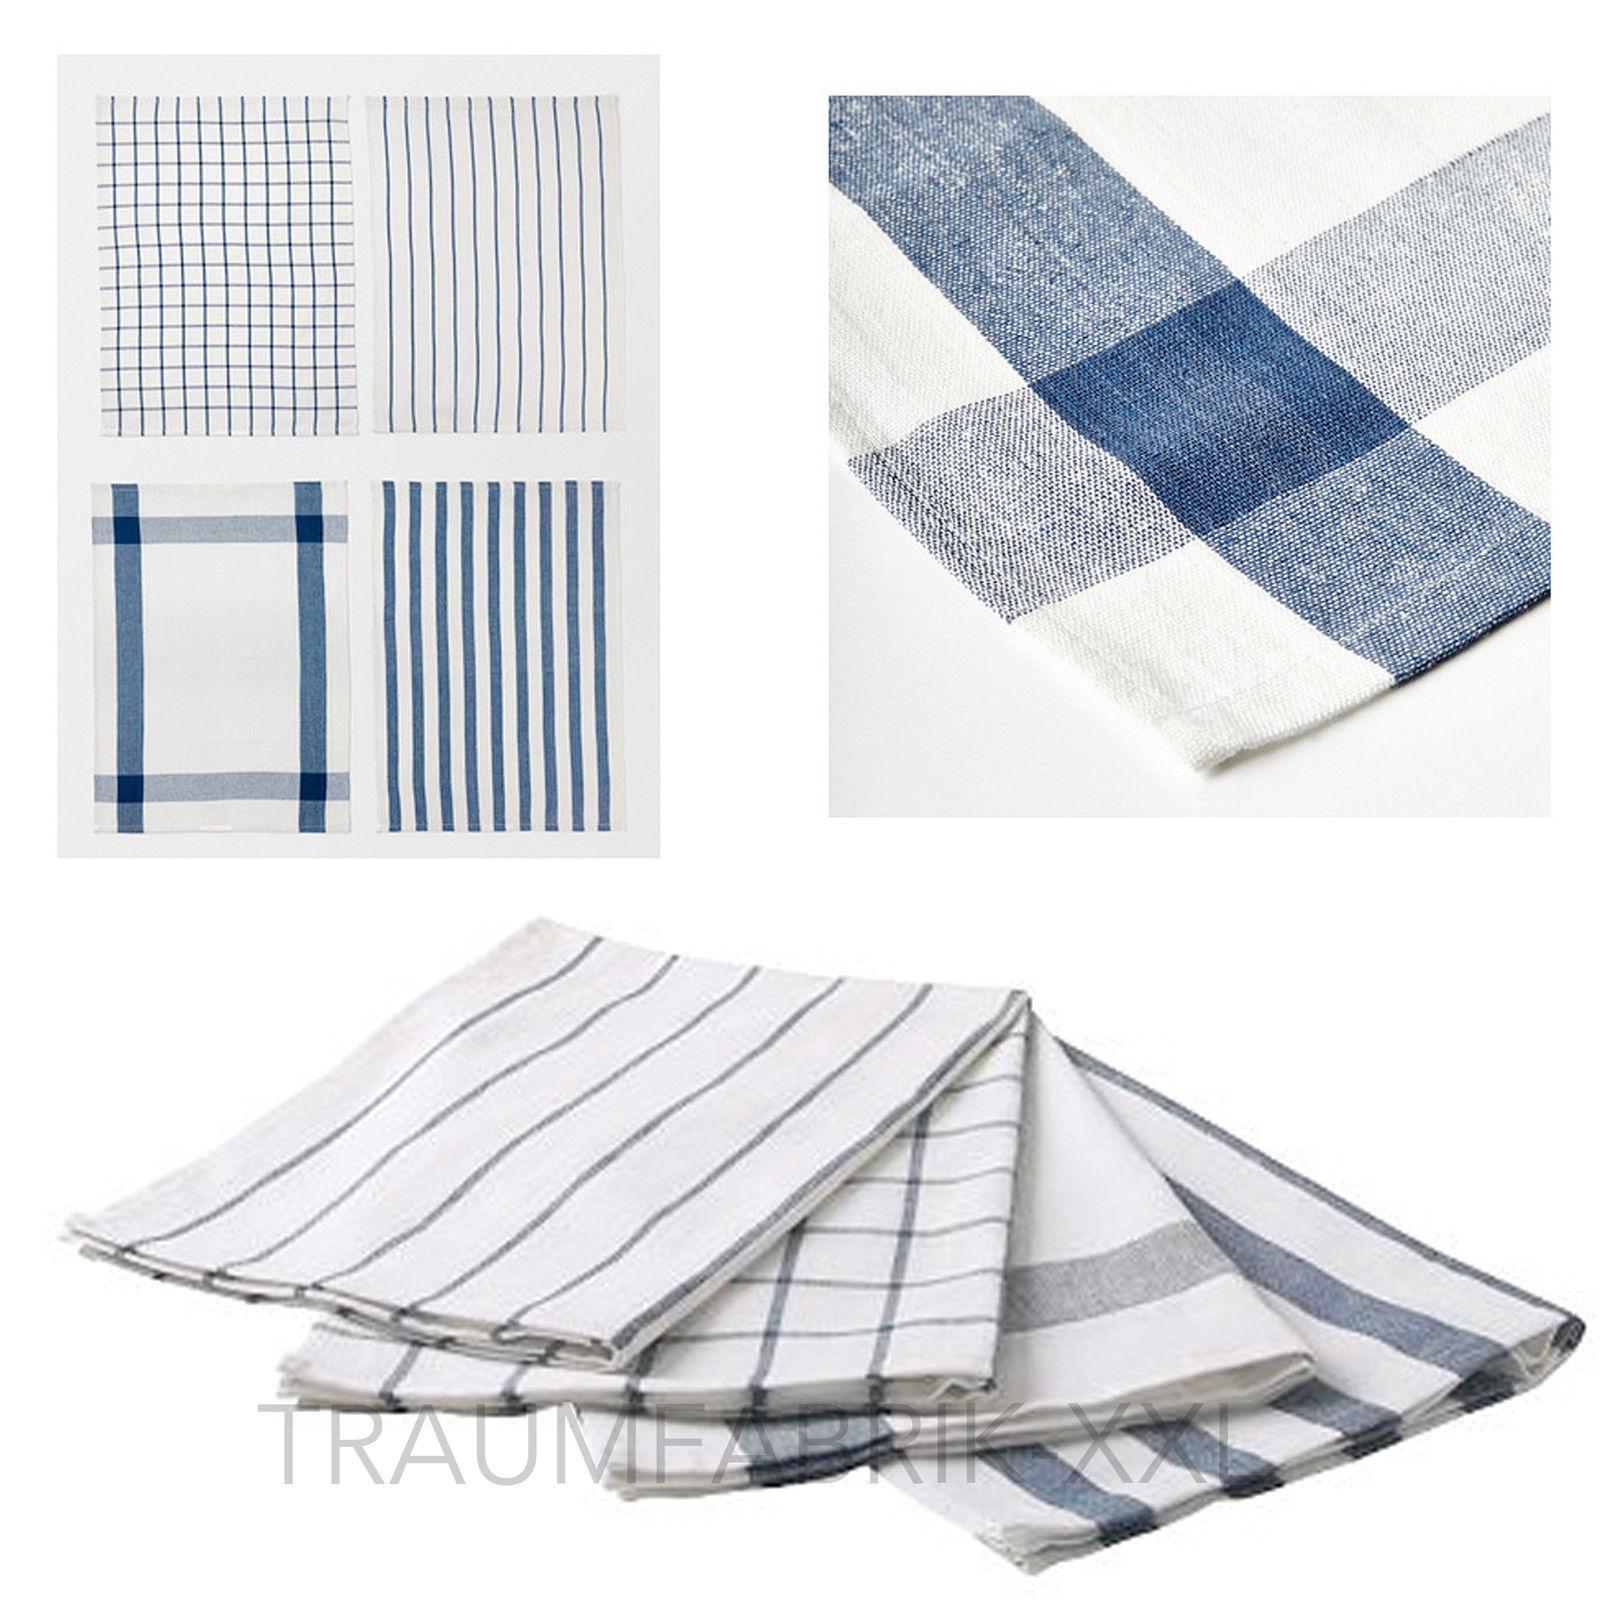 ikea elly 4 x geschirrtuch 100 baumwolle geschirrt cher 4er set handtuch blau traumfabrik xxl. Black Bedroom Furniture Sets. Home Design Ideas